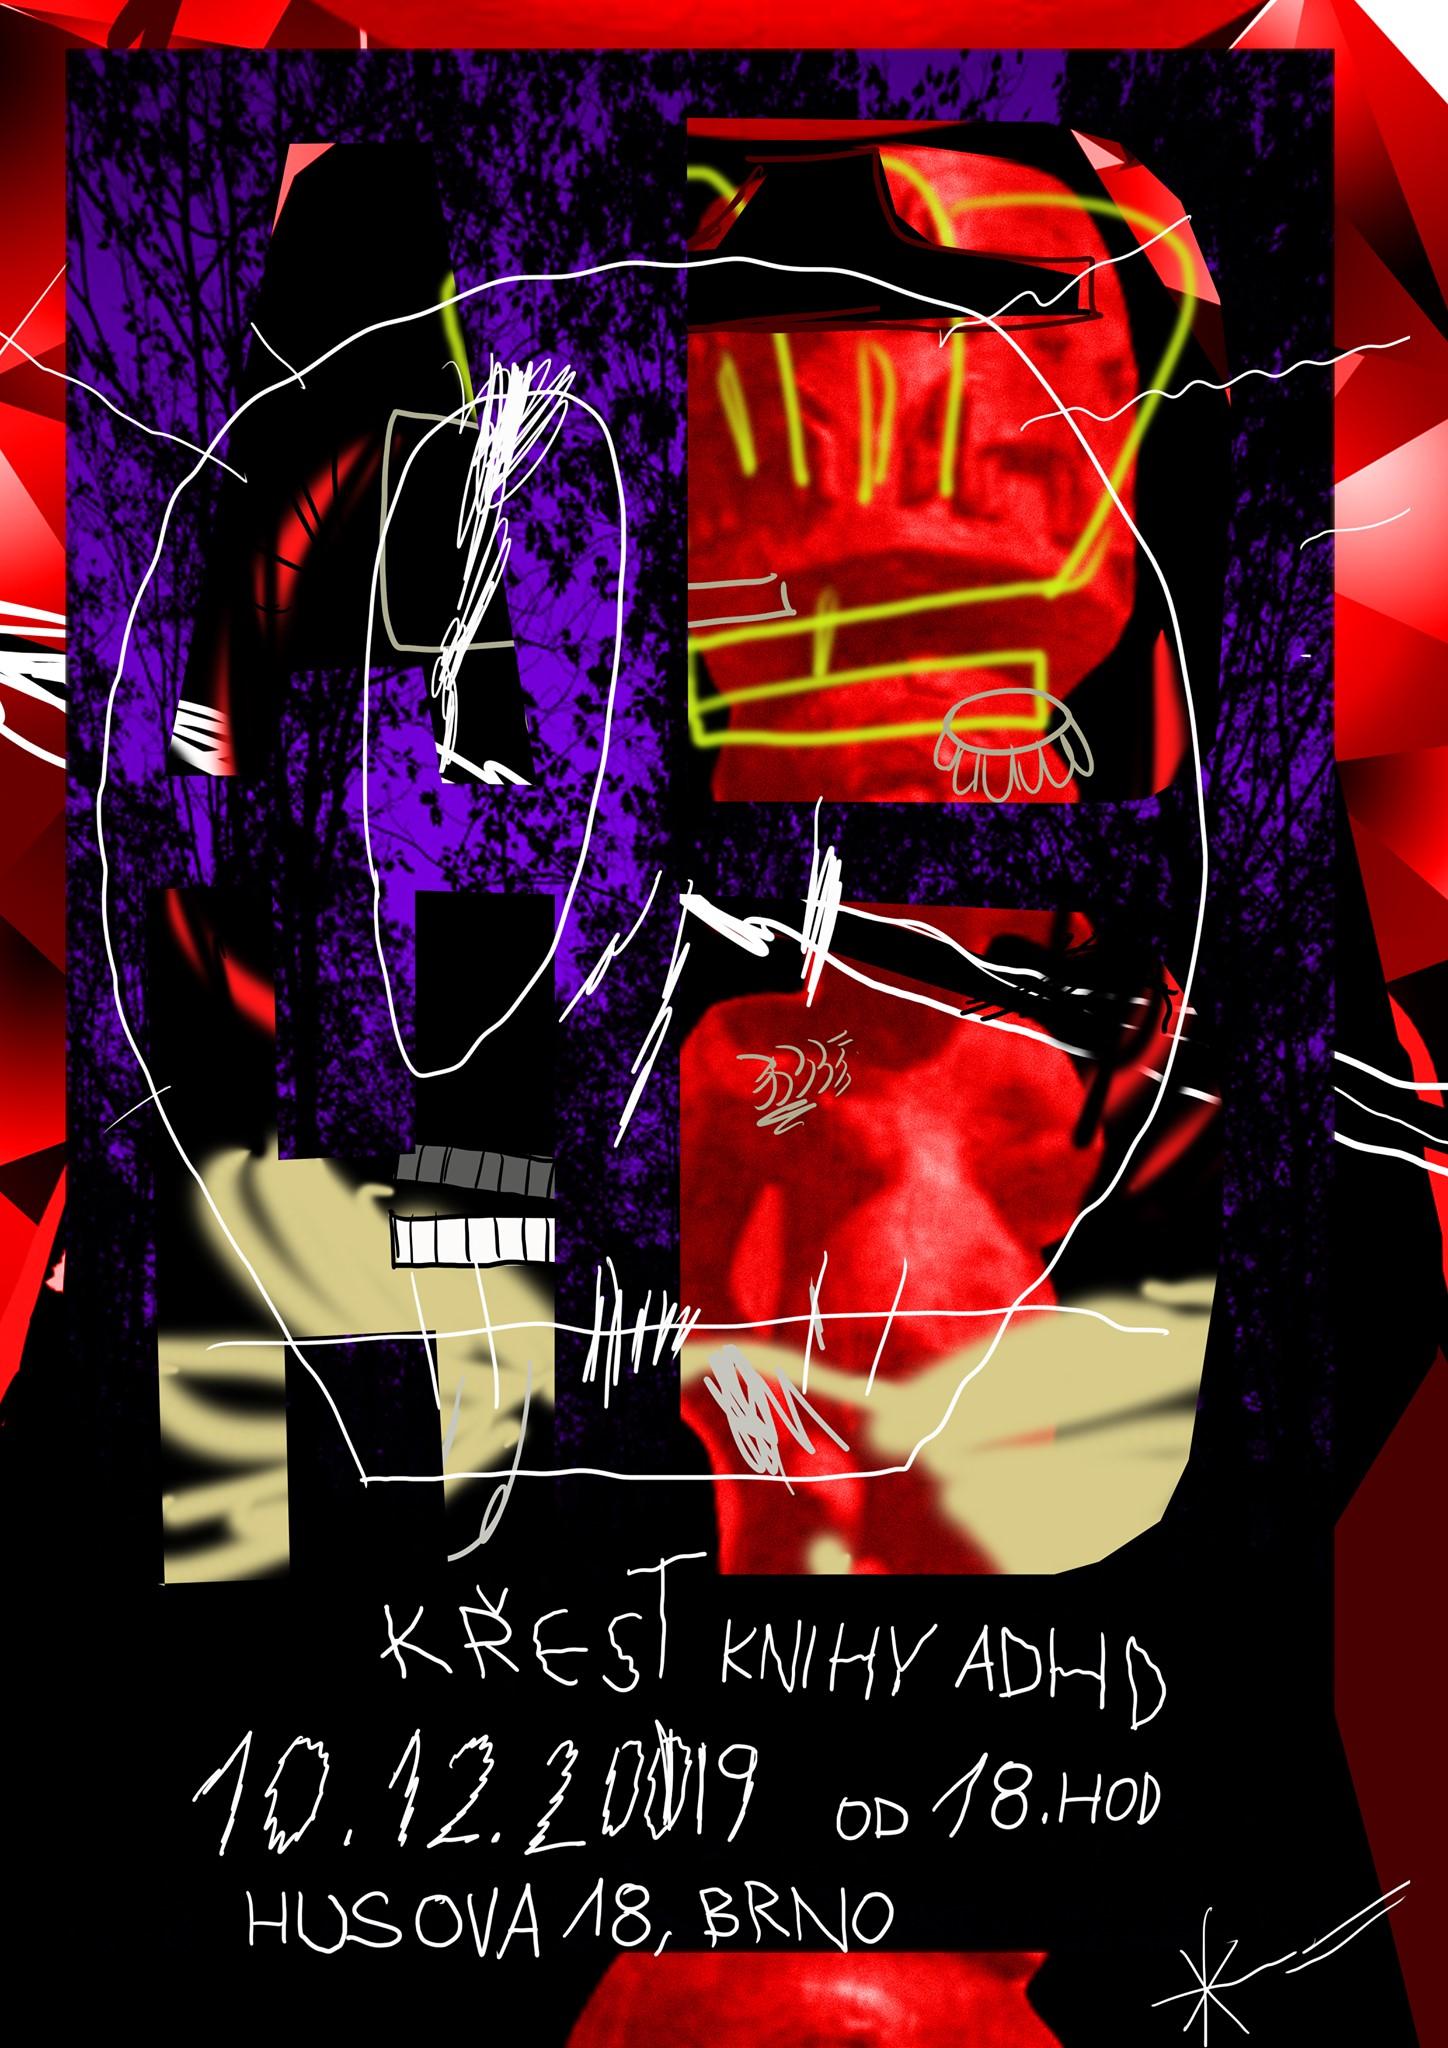 ÚT / 10.12. / 18.00 / Křest knihy ADHD / křest knihy